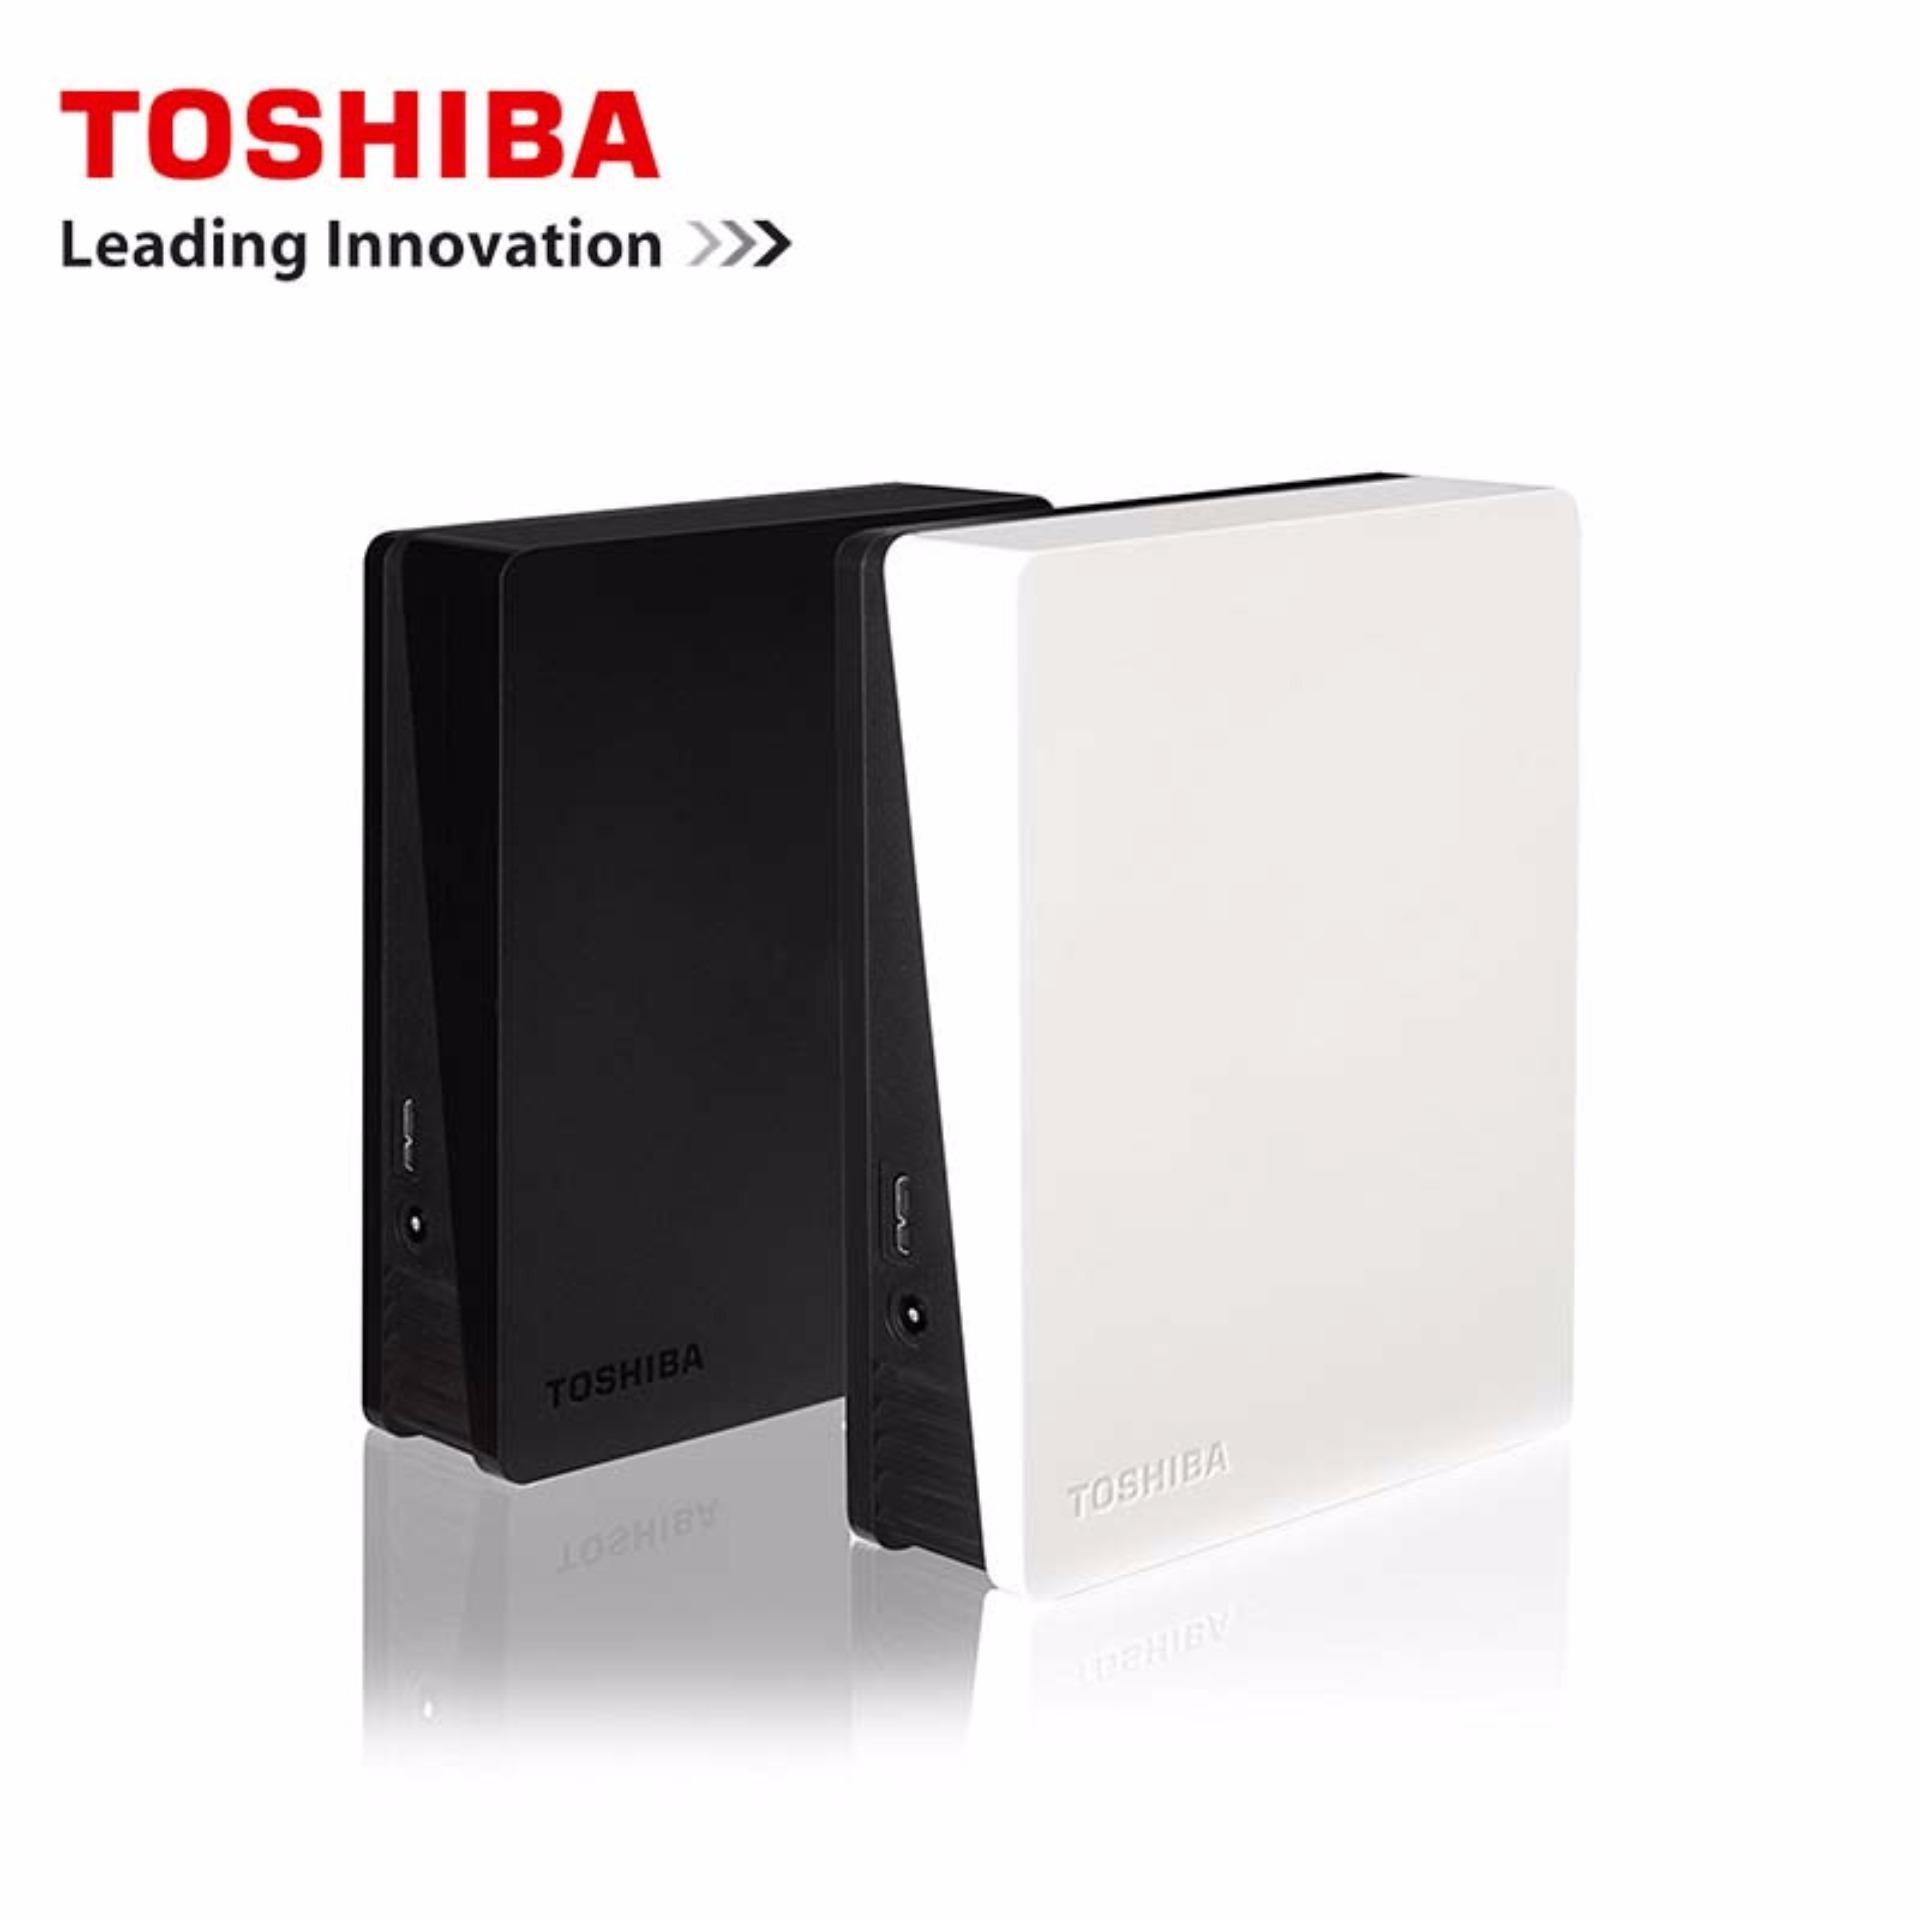 Toshiba Canvio Desk Hardisk Eksternal 3tb 35 Usb30 Hitam Daftar Wd My Book Black Hd Hdd External 3 5